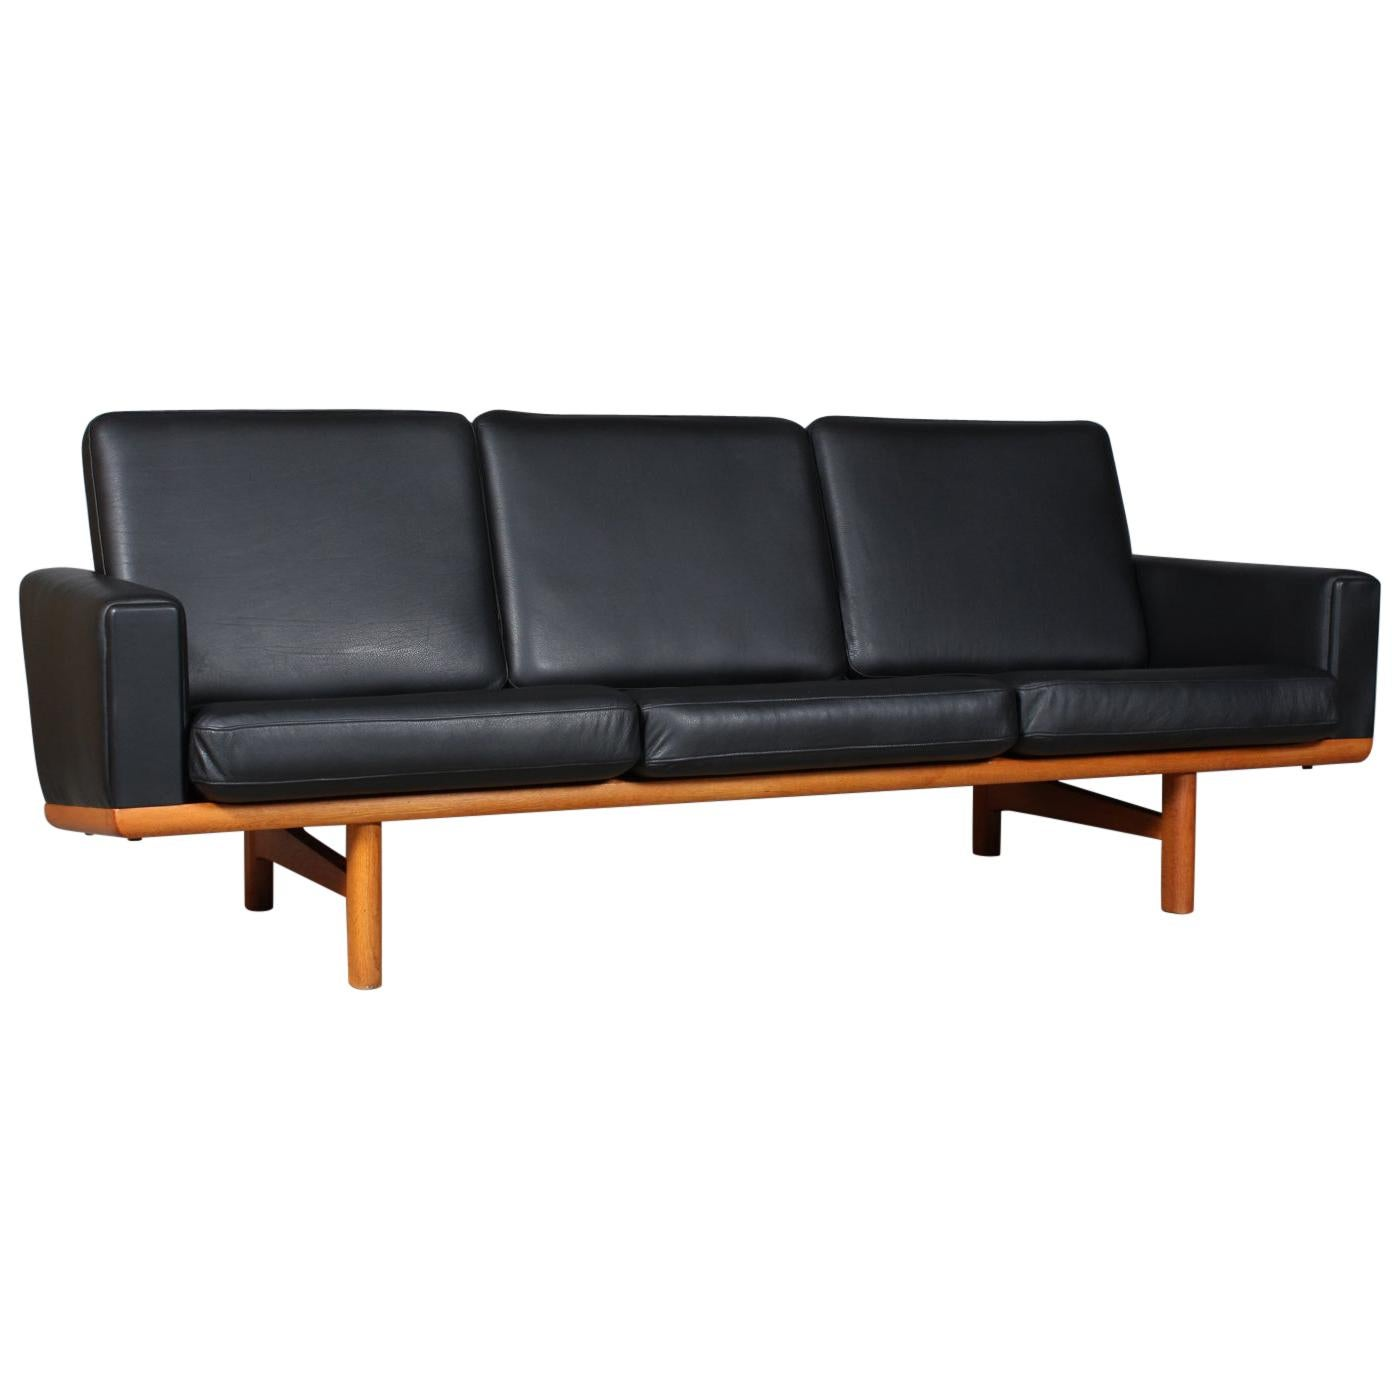 Hans J. Wegner Three-Seat Sofa